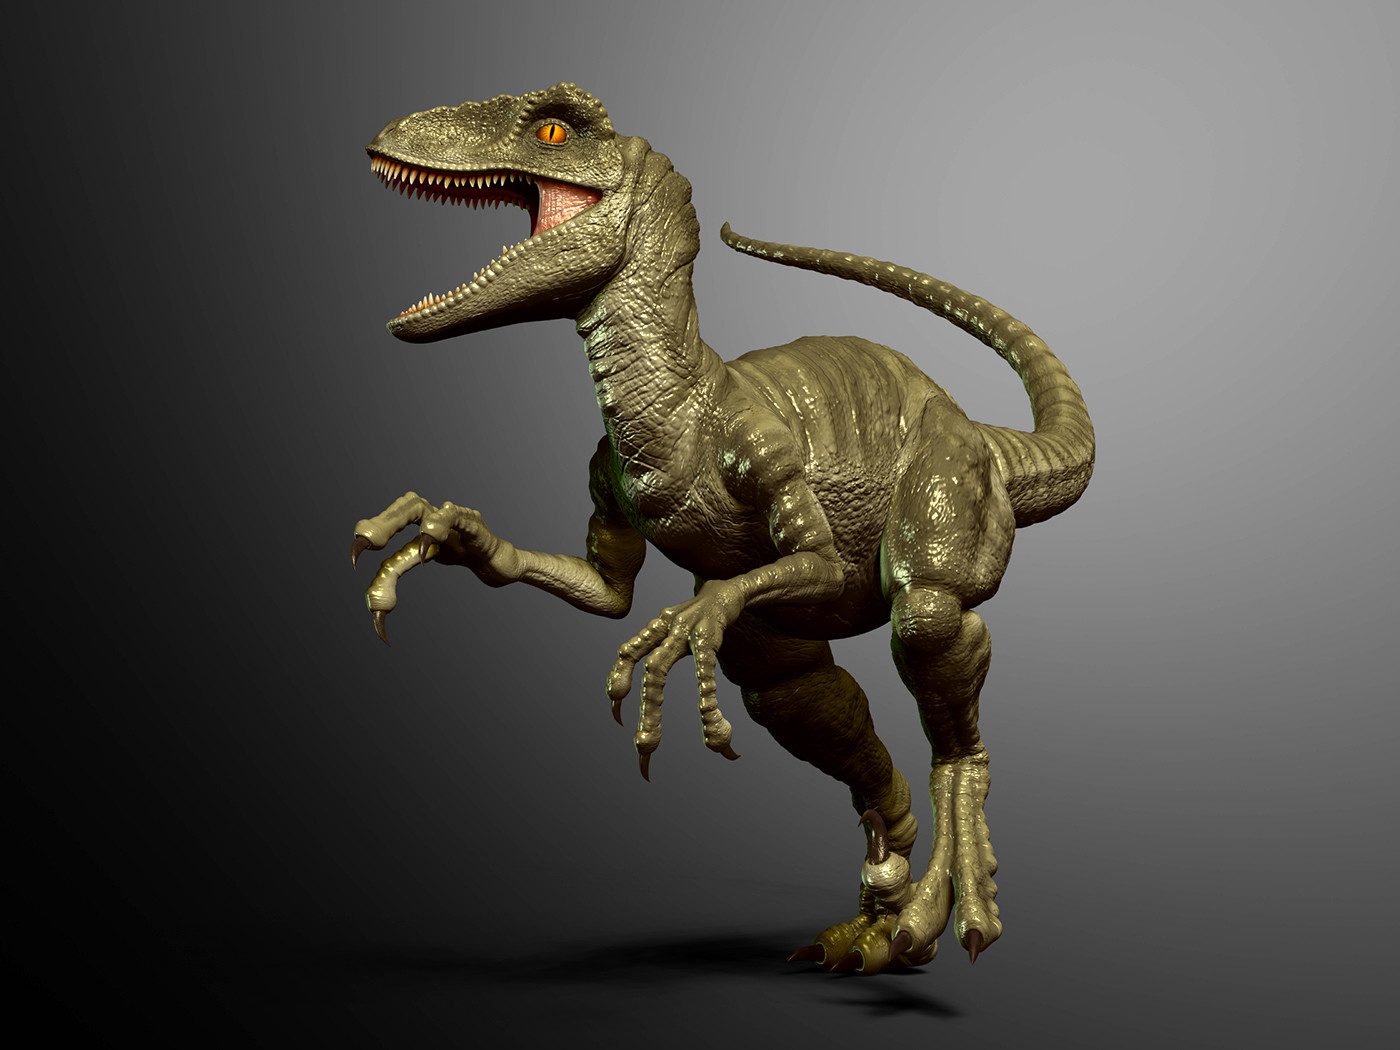 Картинки динозавров рапторекс